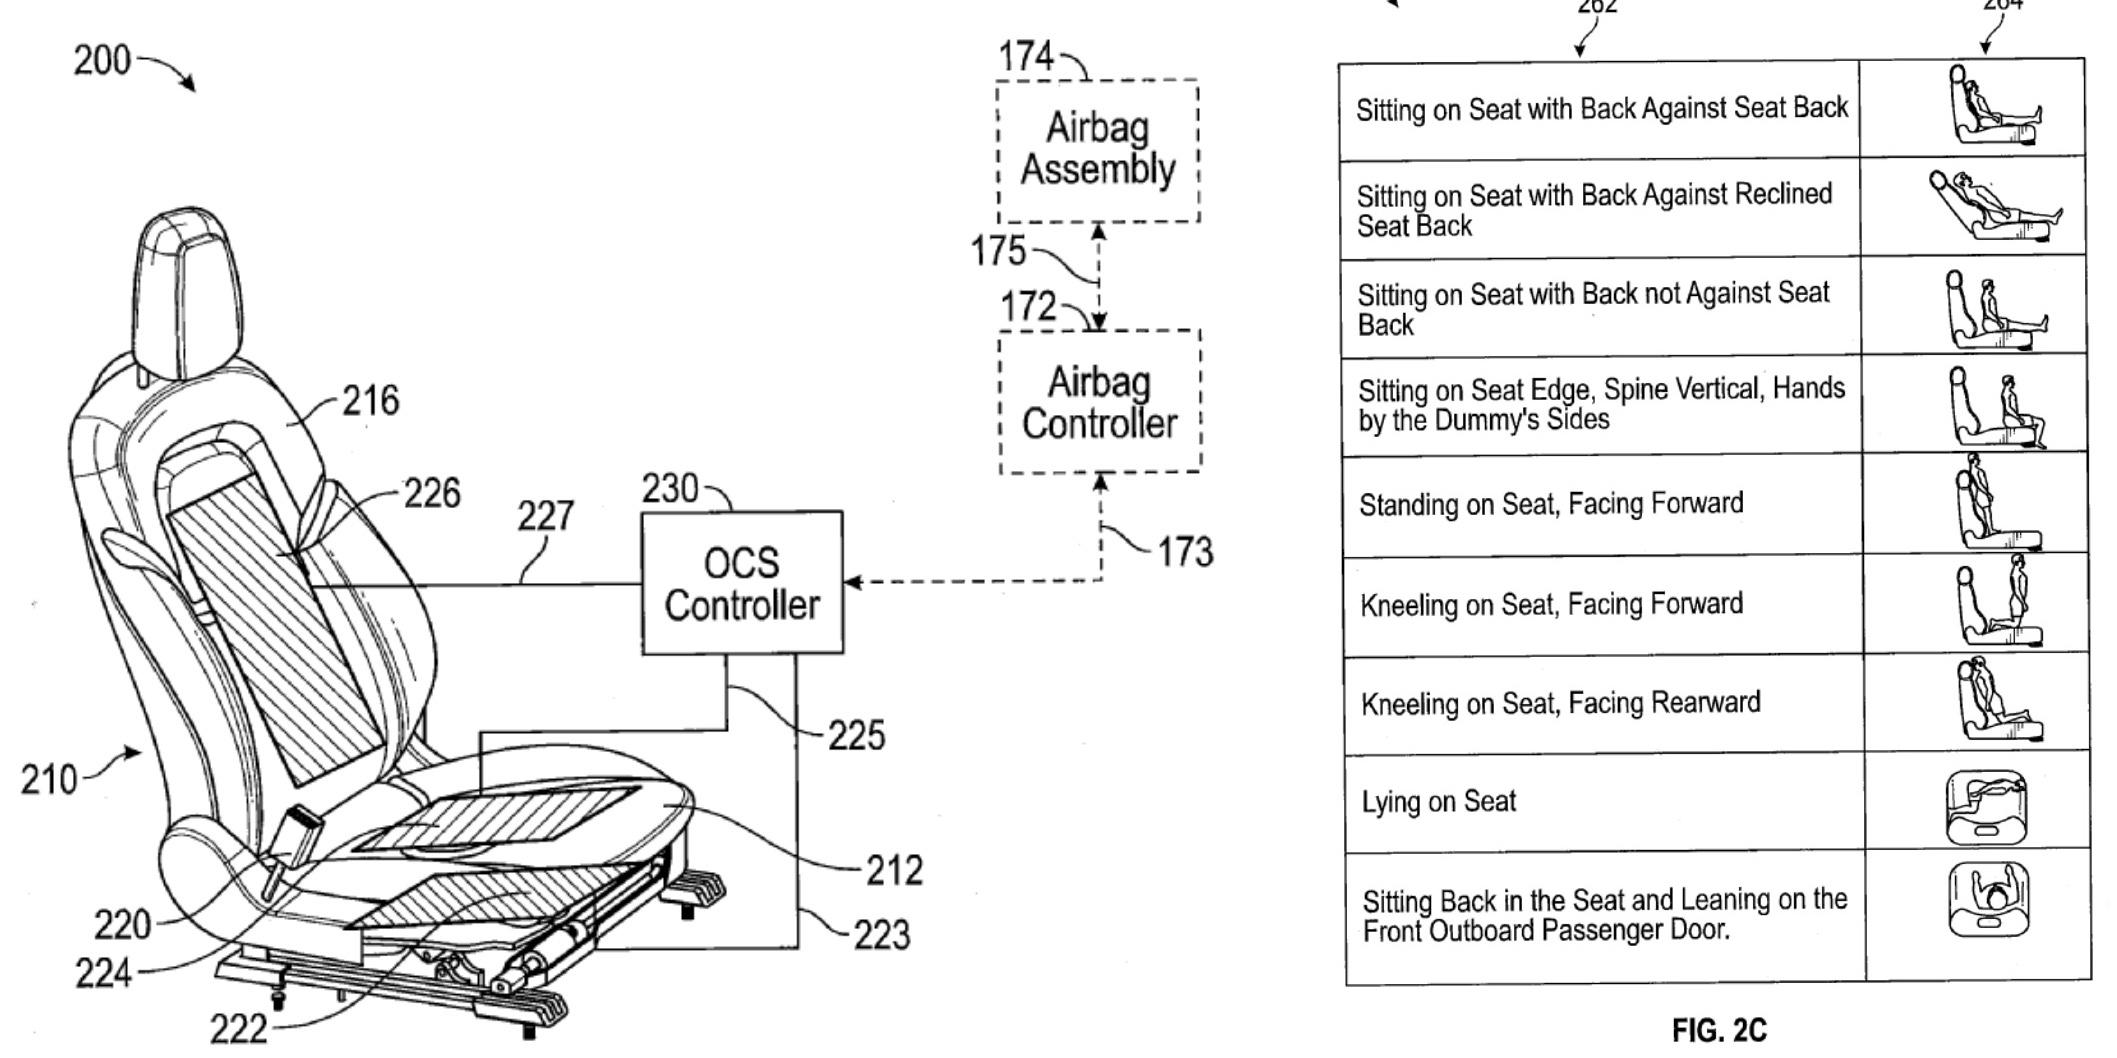 on air bag schematics seat sensor